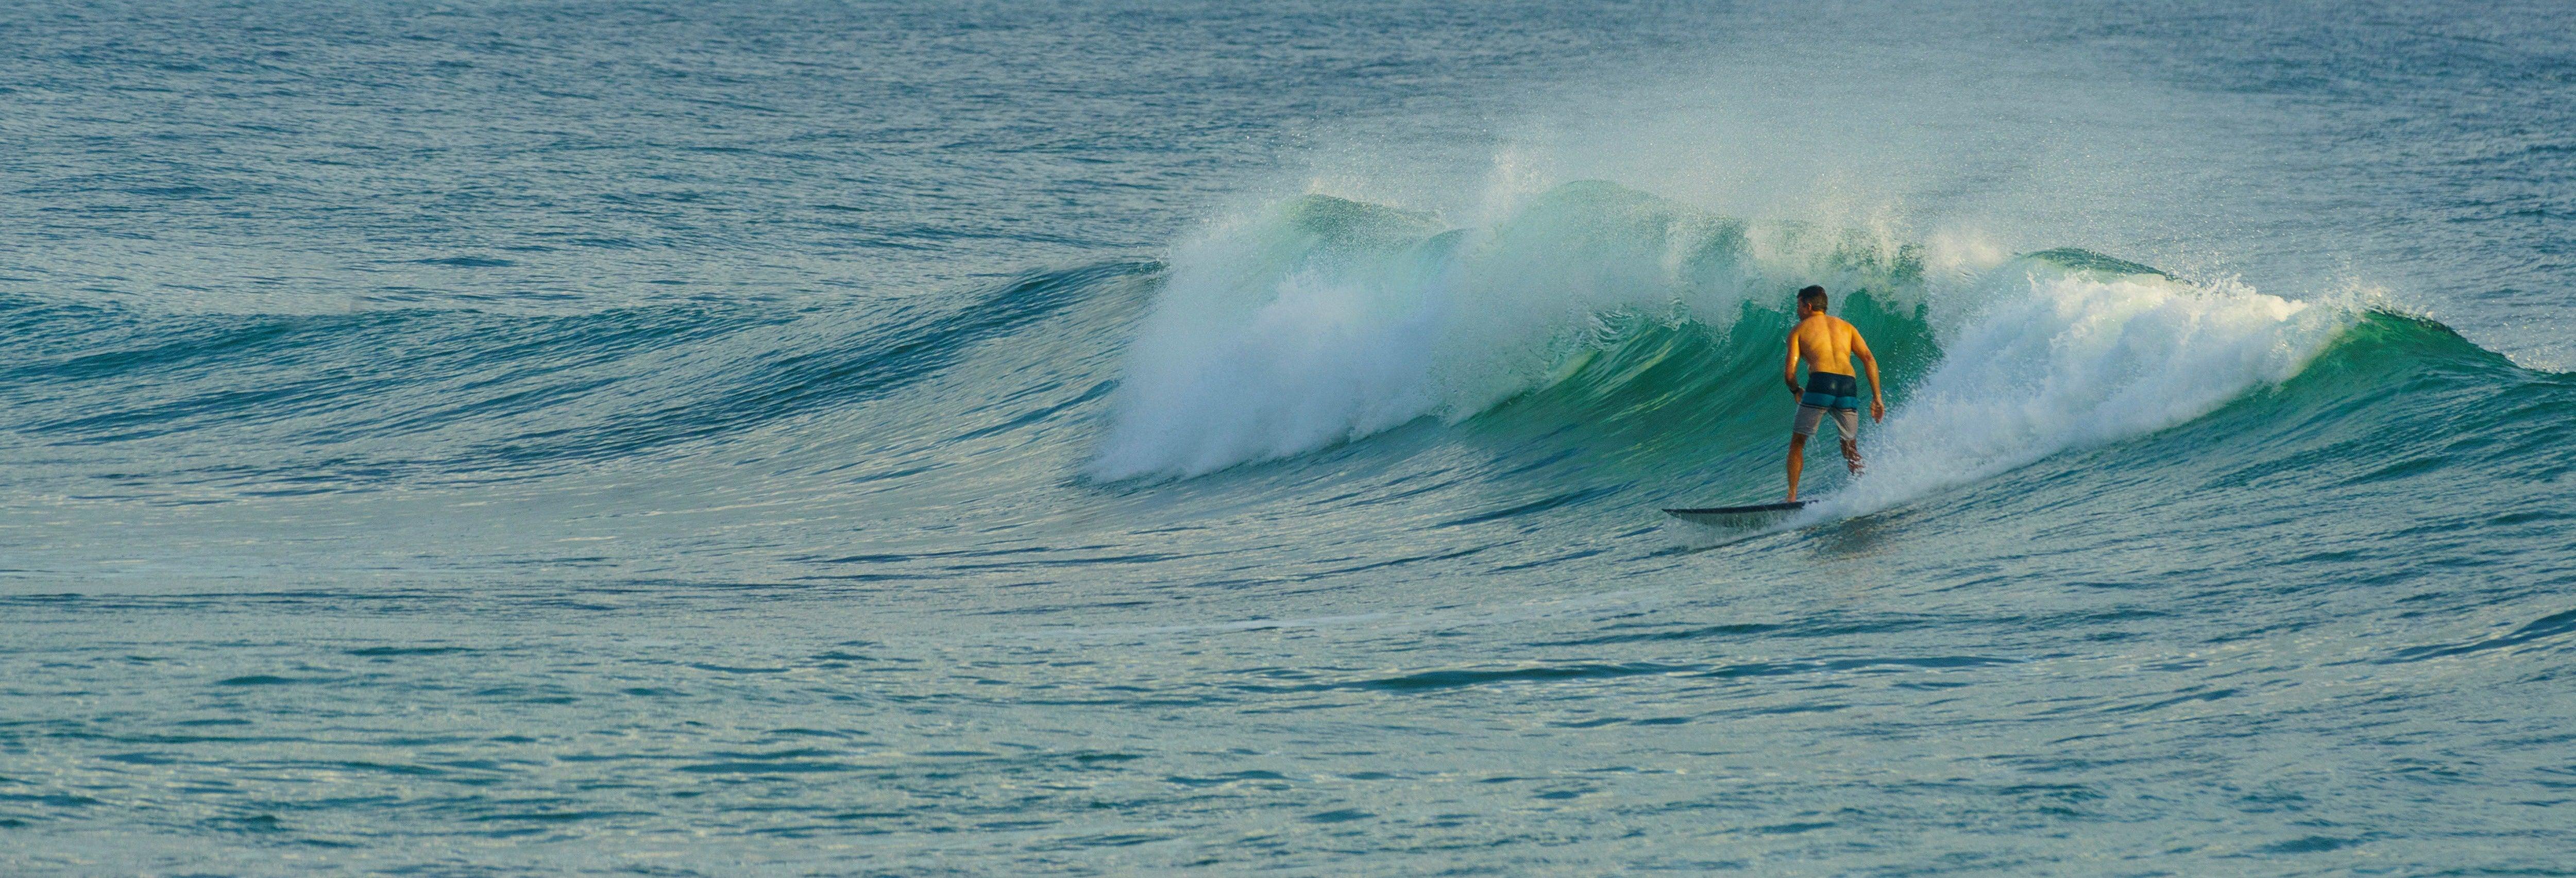 Surfe em Gold Coast + Farol de Fingal Head